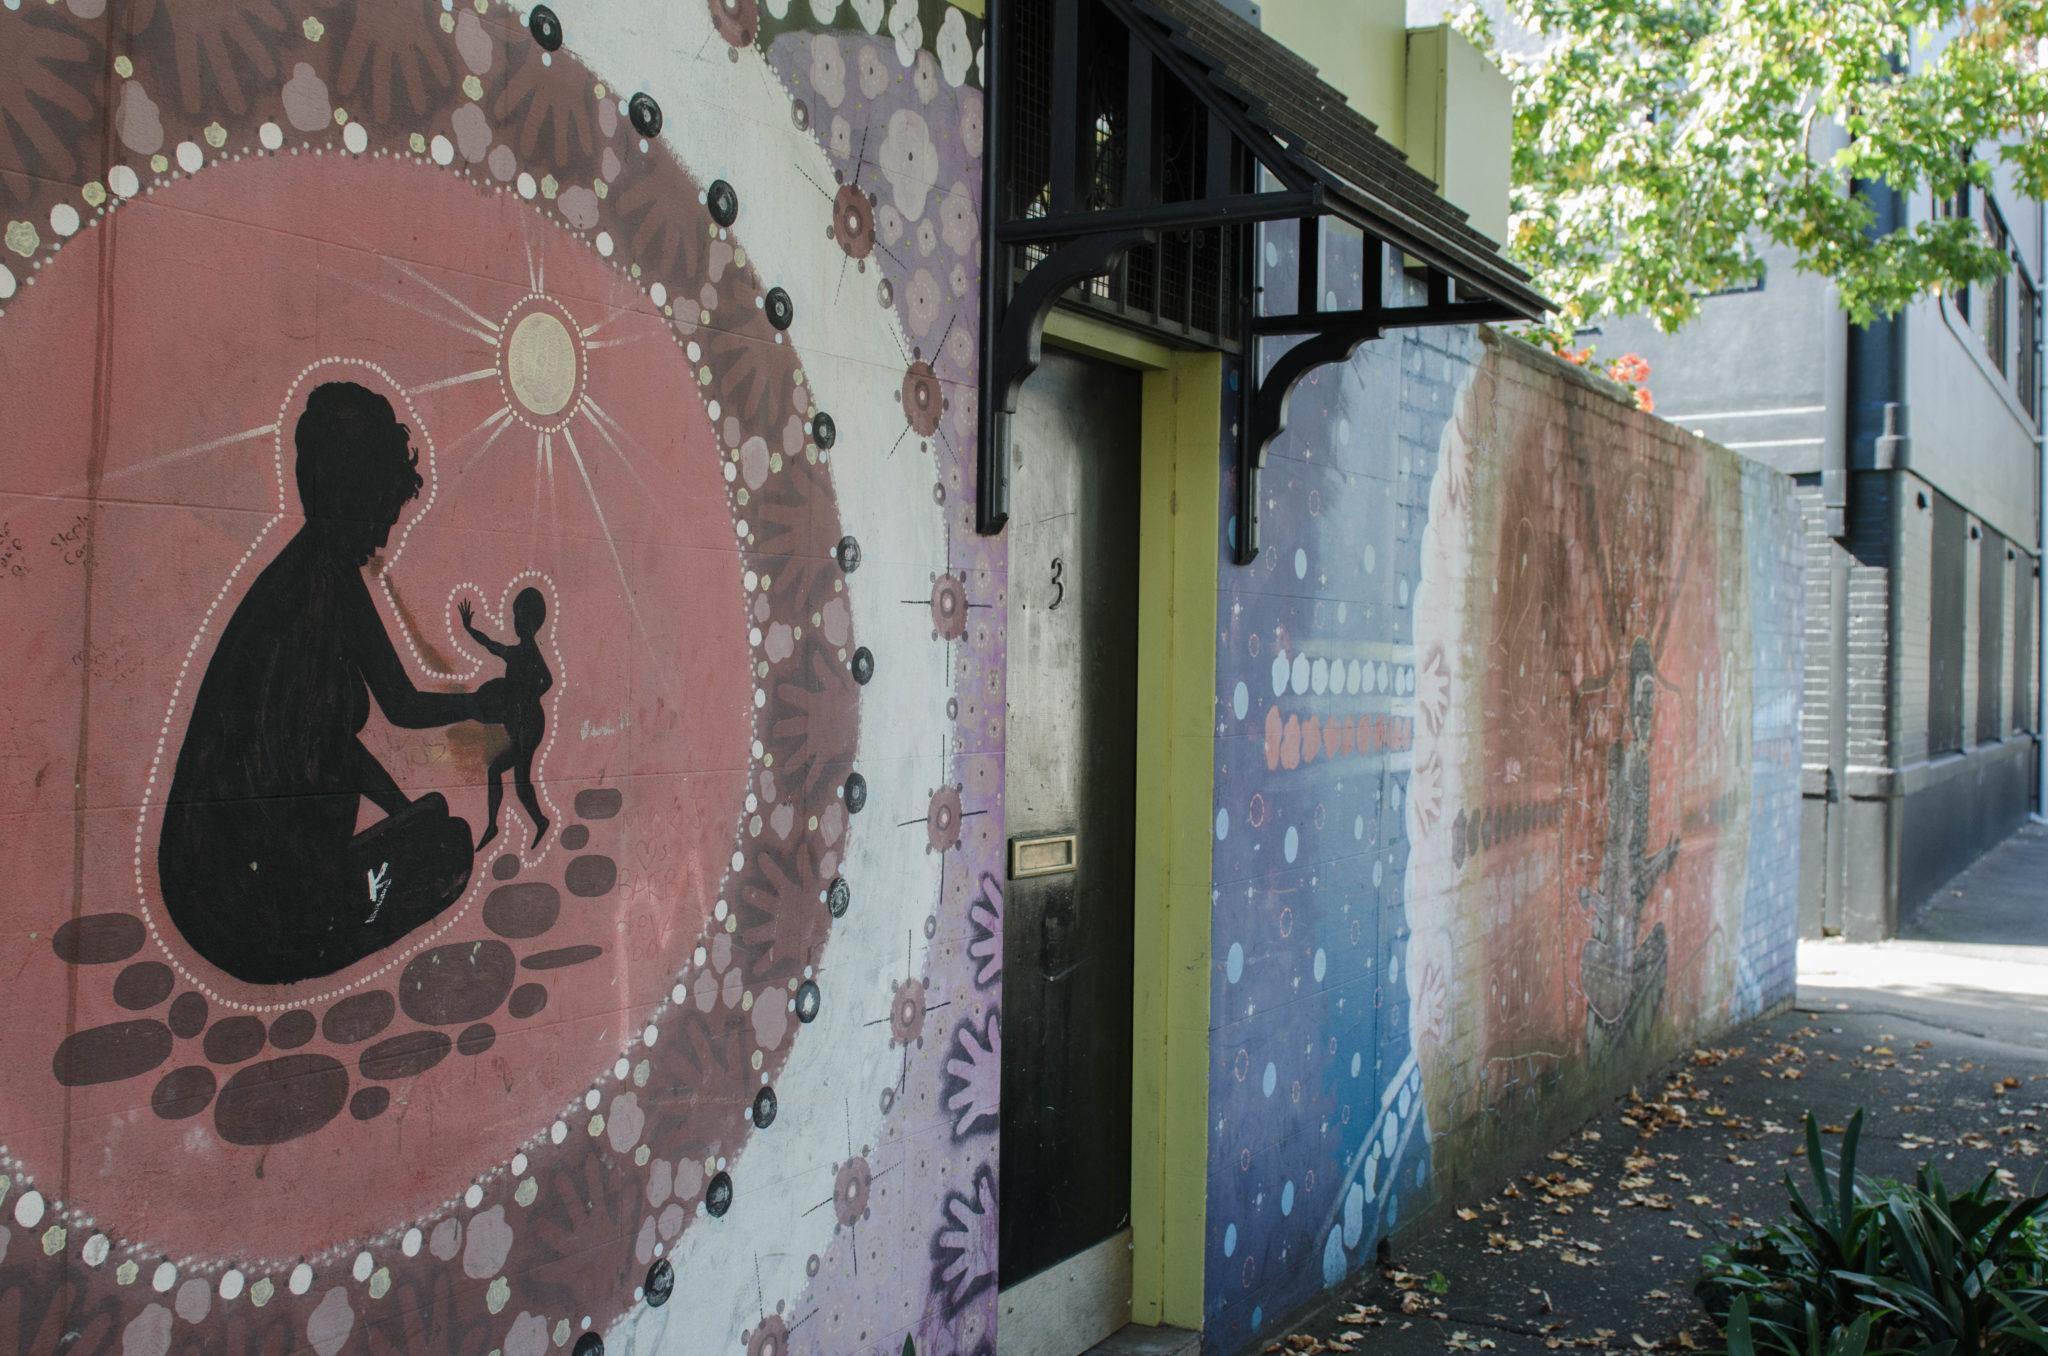 Redfern Sydney: Traces of Redfern's Aboriginal history can still be found.